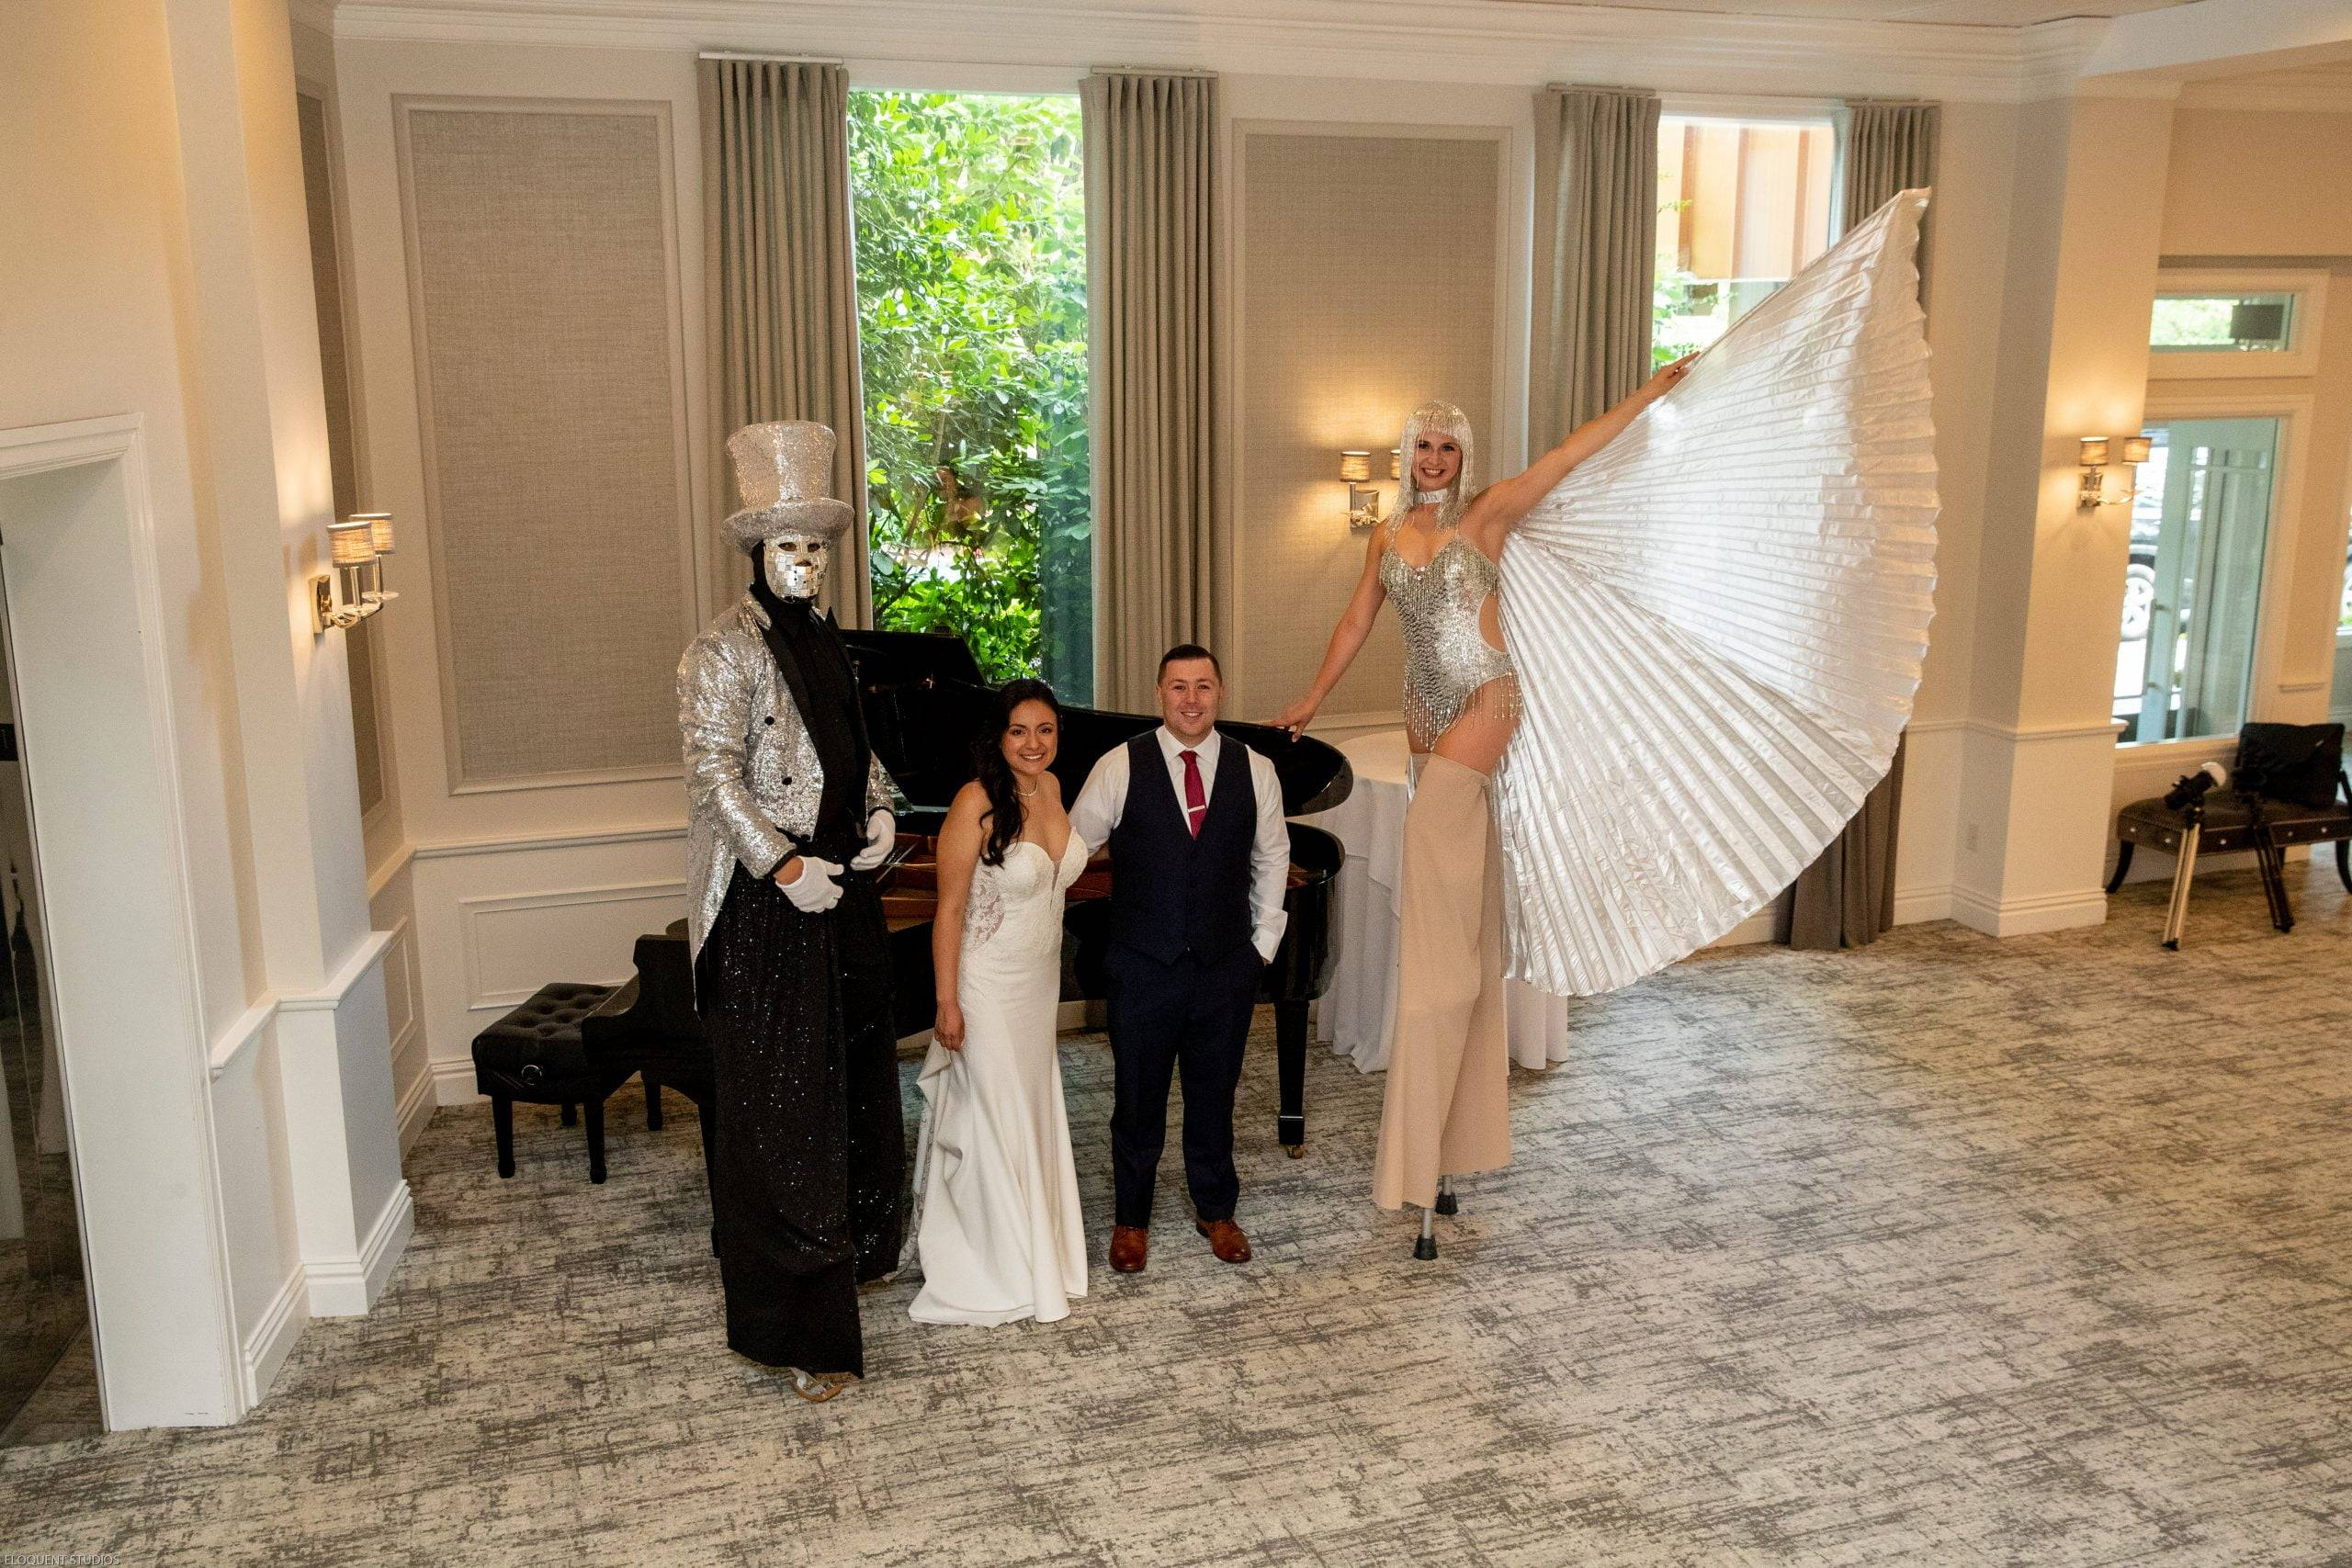 Brooklake bride and groom with stilt walkers